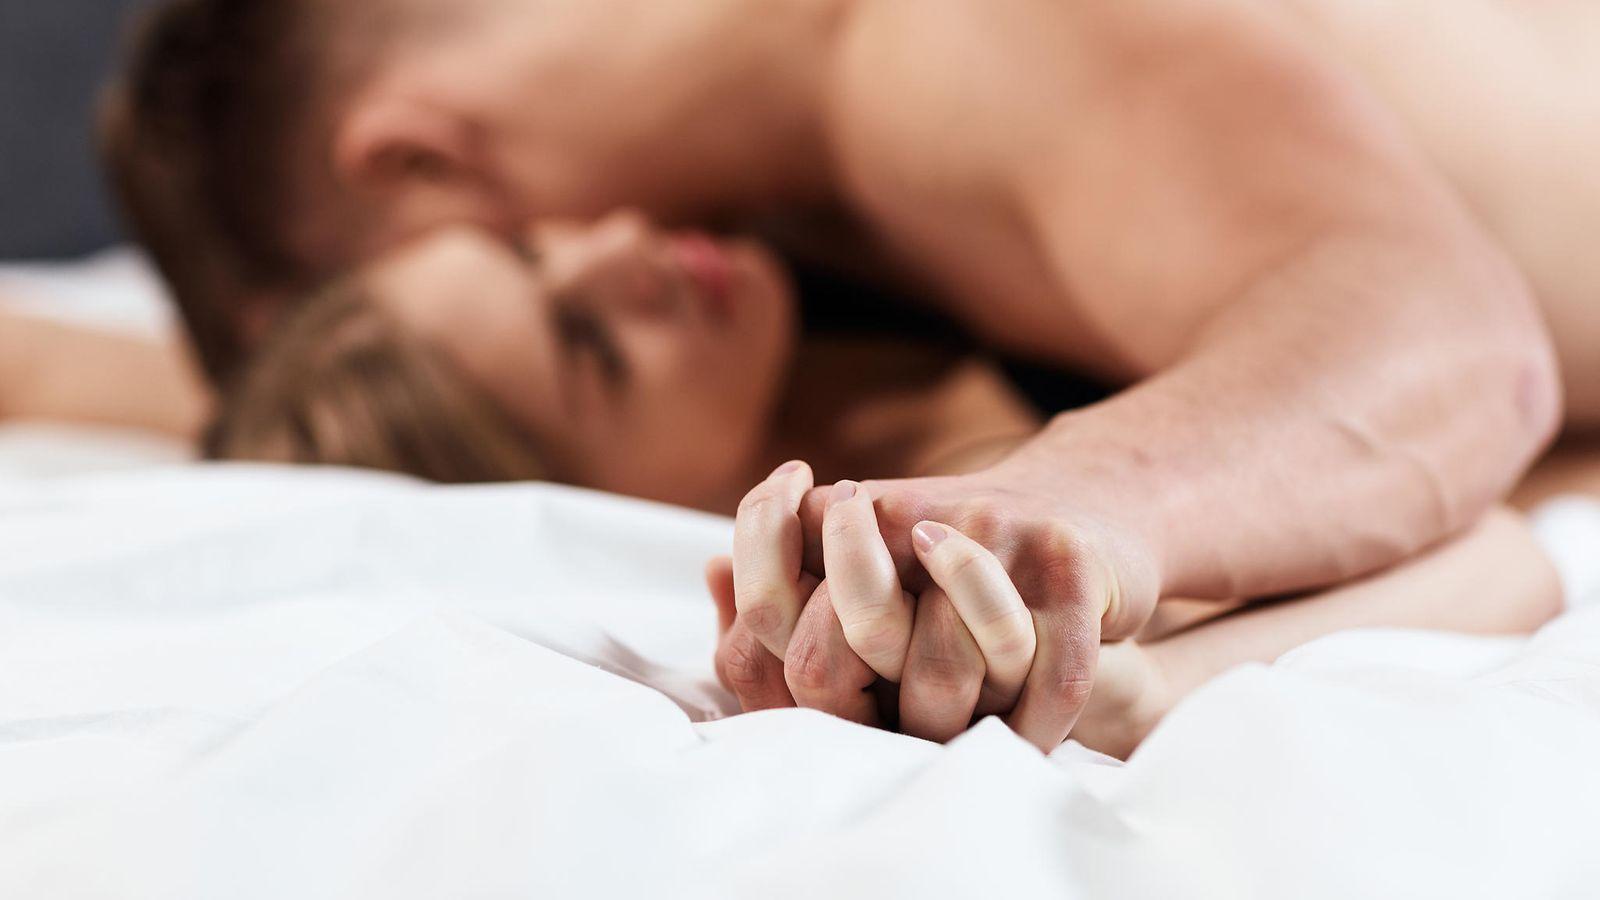 anaali-porno sivu